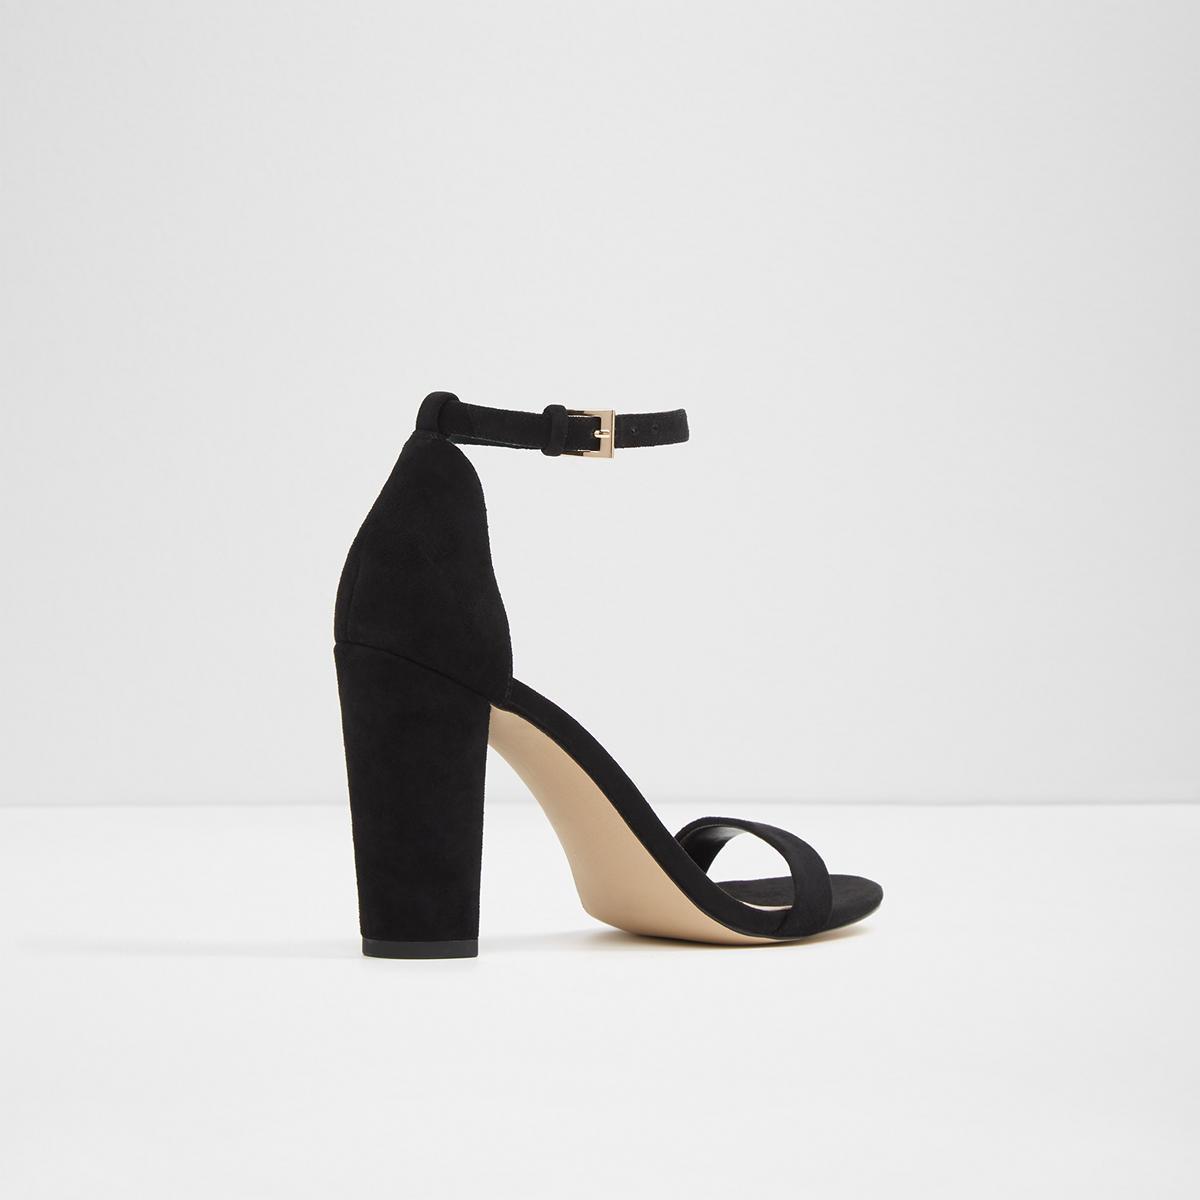 b4dfec7bffb Myly Black Other Women s Block heels